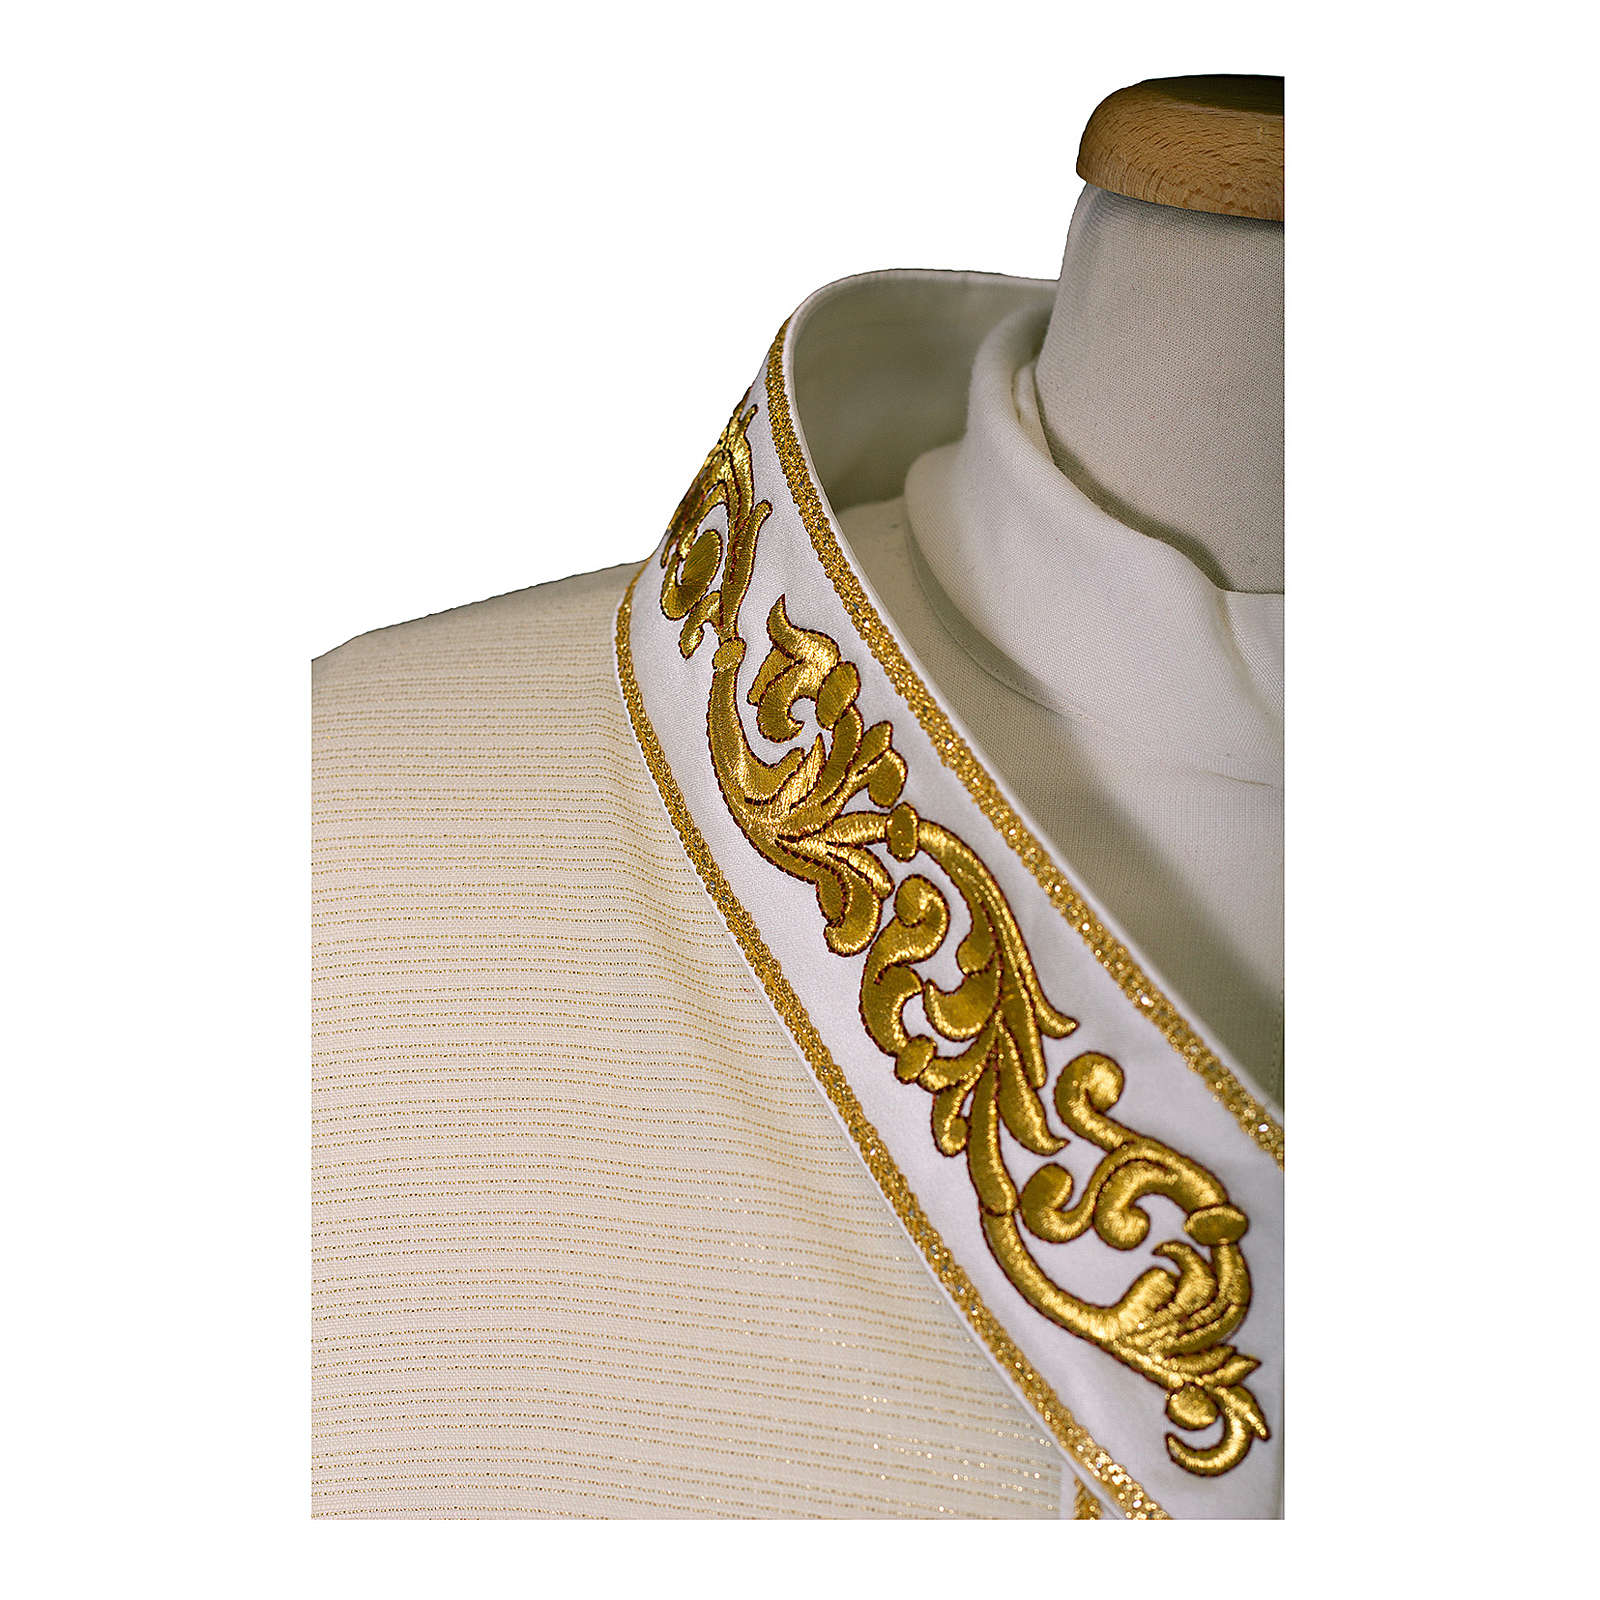 Casula preziosa lana lurex tessuto leggerissimo collo a v ricamato rinforzato 4